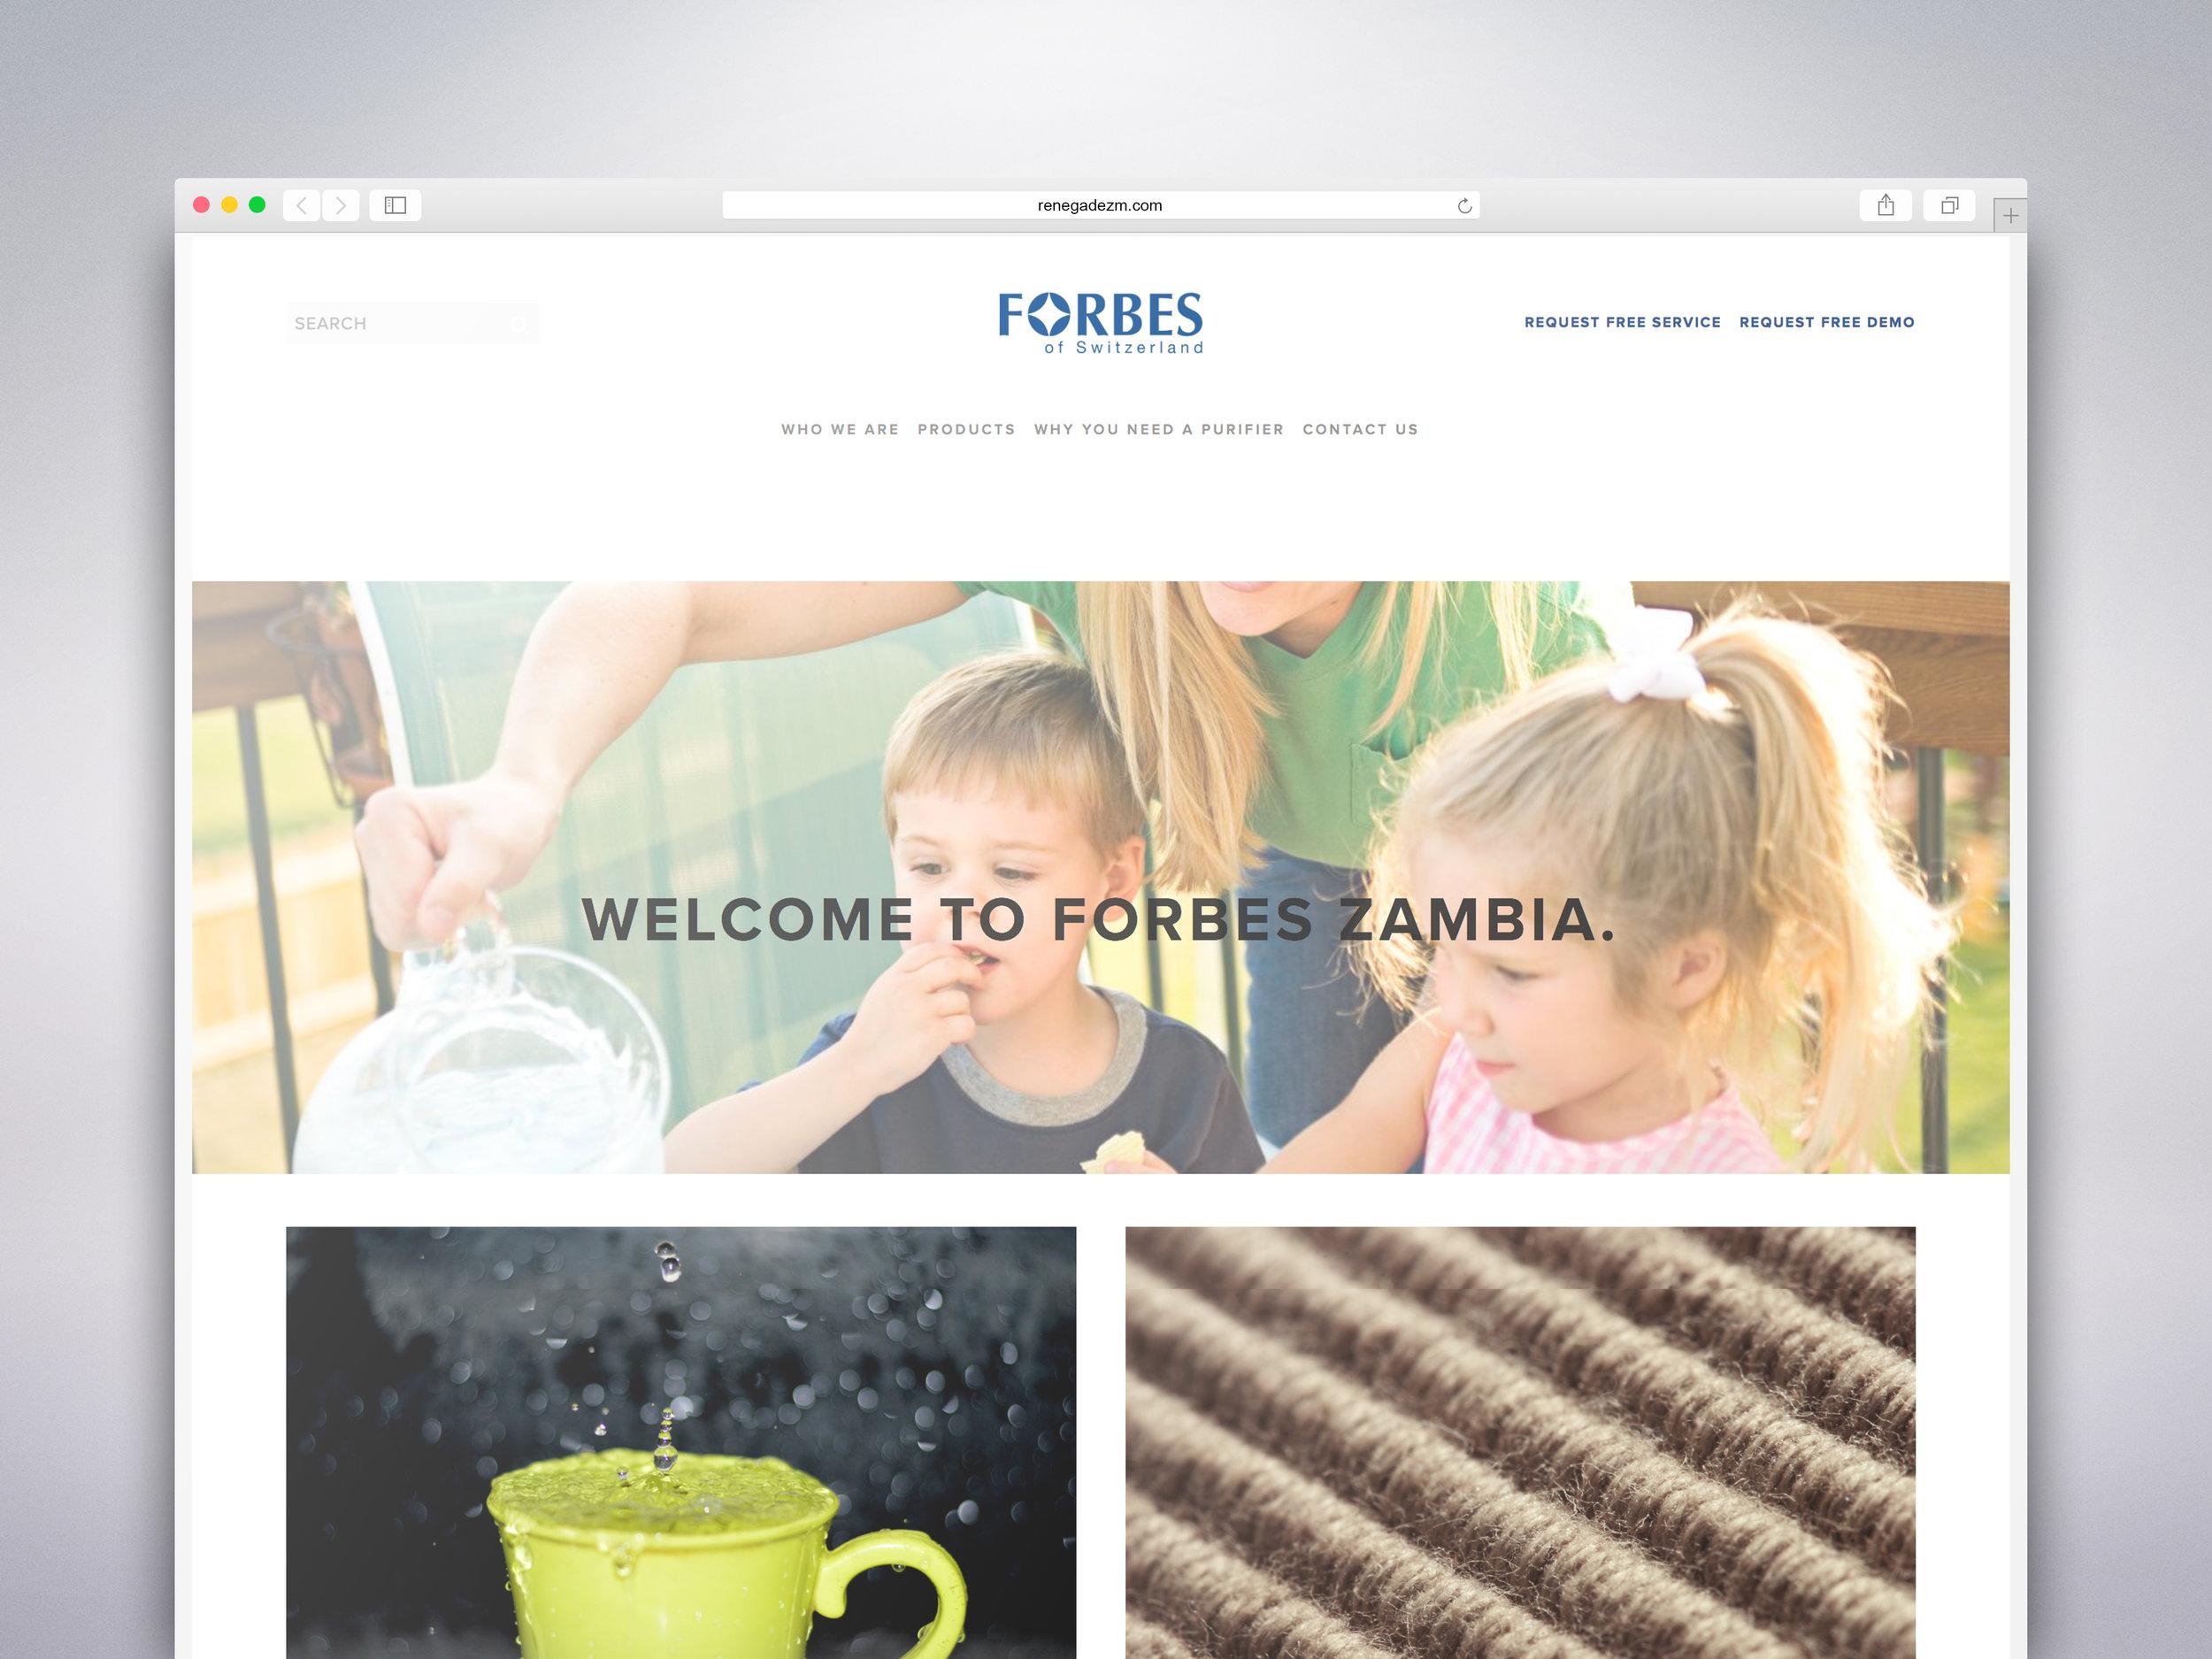 Safari PSD Mockup Forbes.jpg